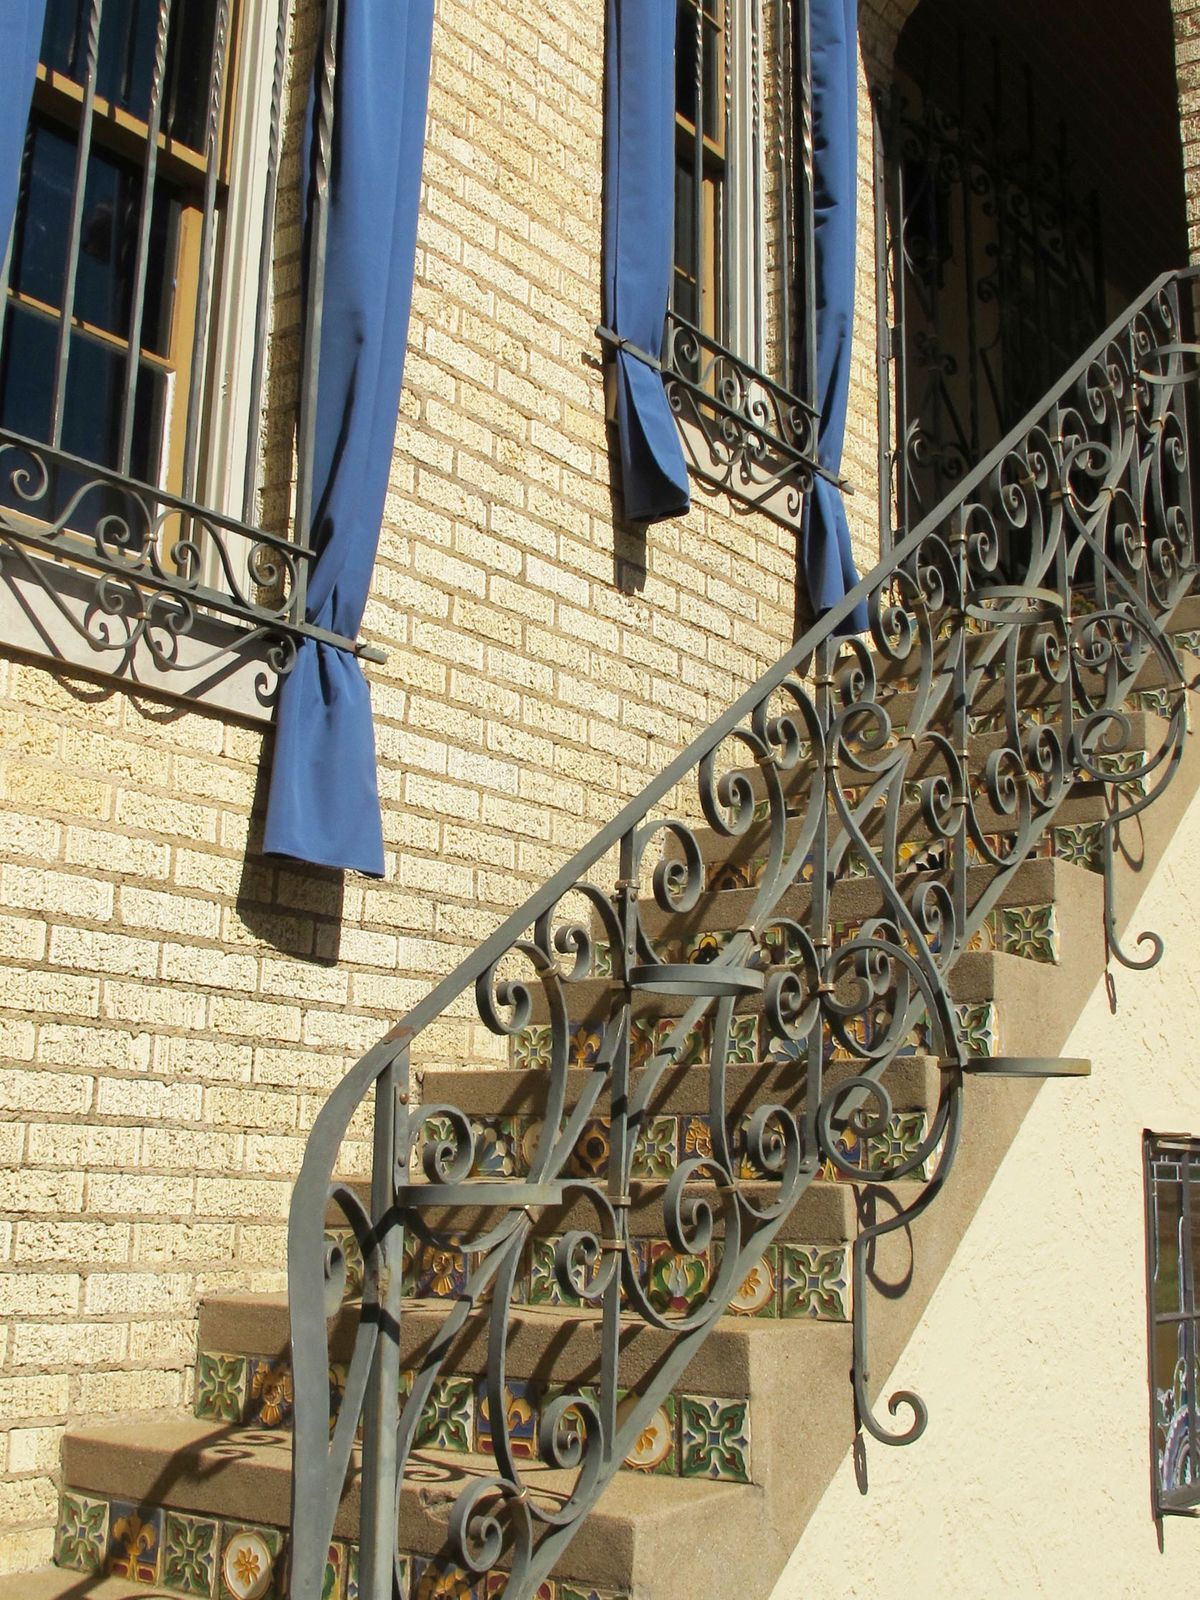 Historic Hutsell Mediterranean Home Photo Video Shoot Location 2.jpg